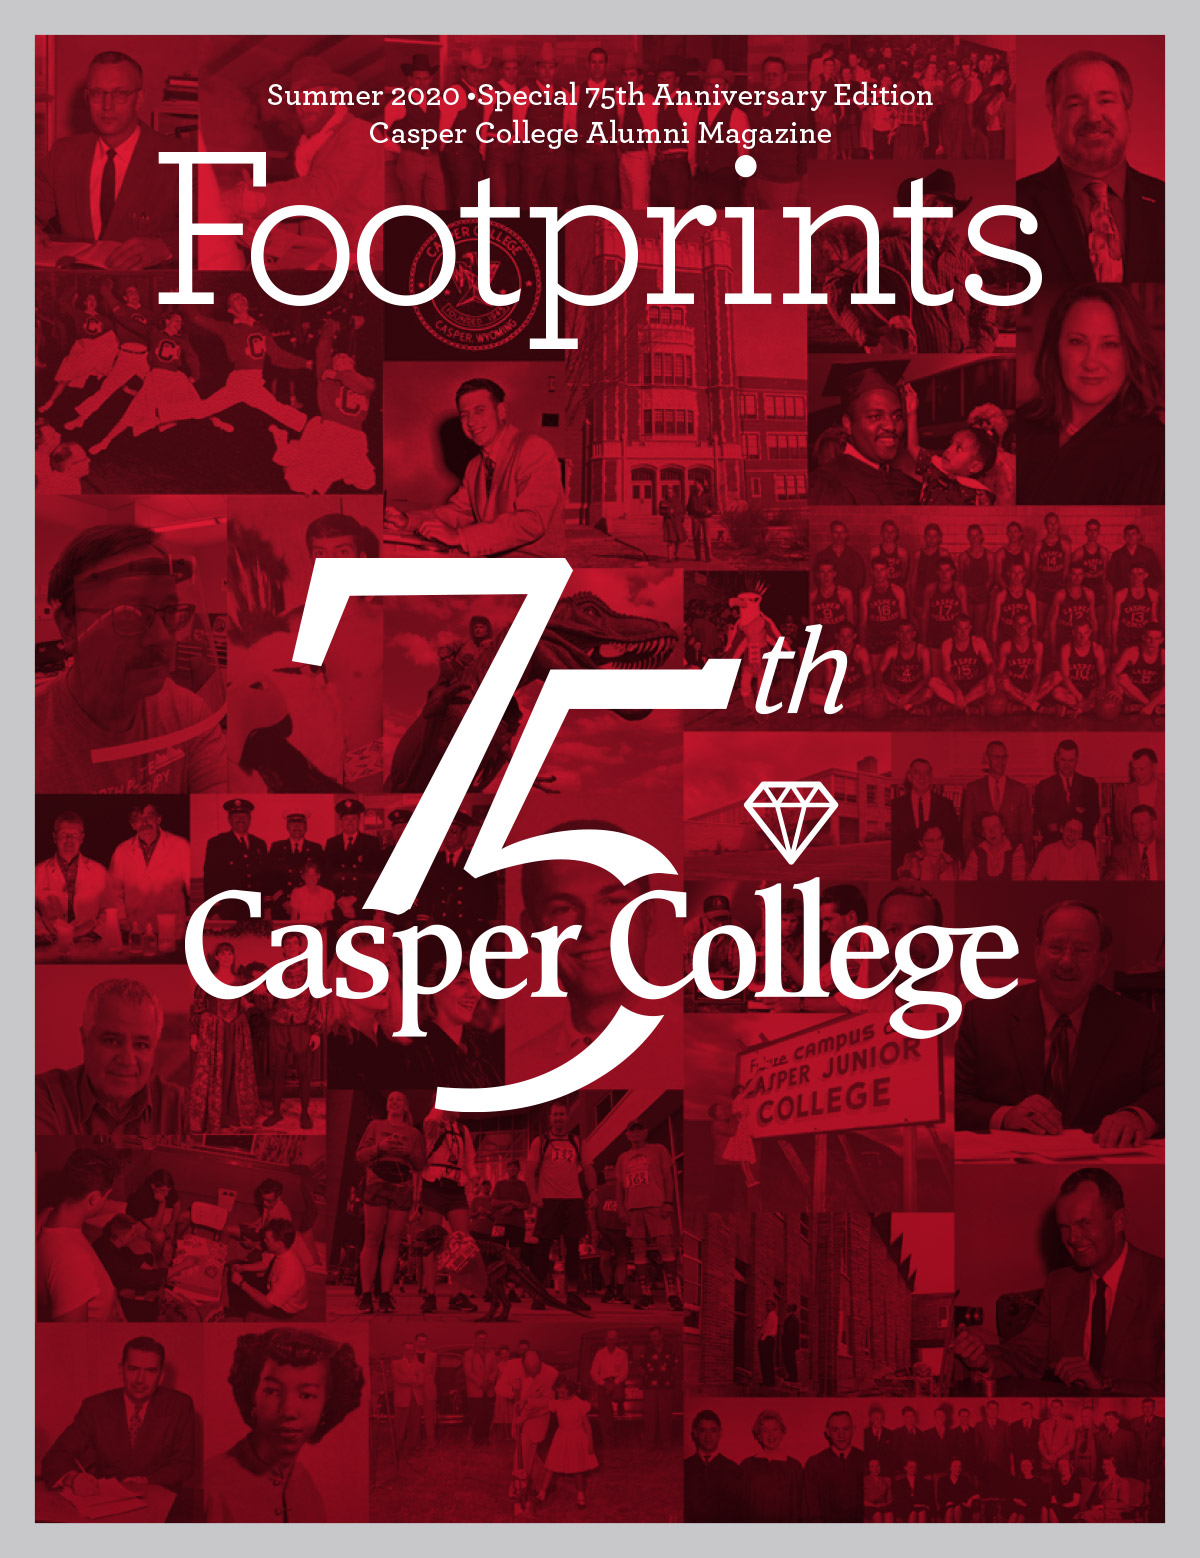 Footprints Magazine - Summer 2020 Cover Image